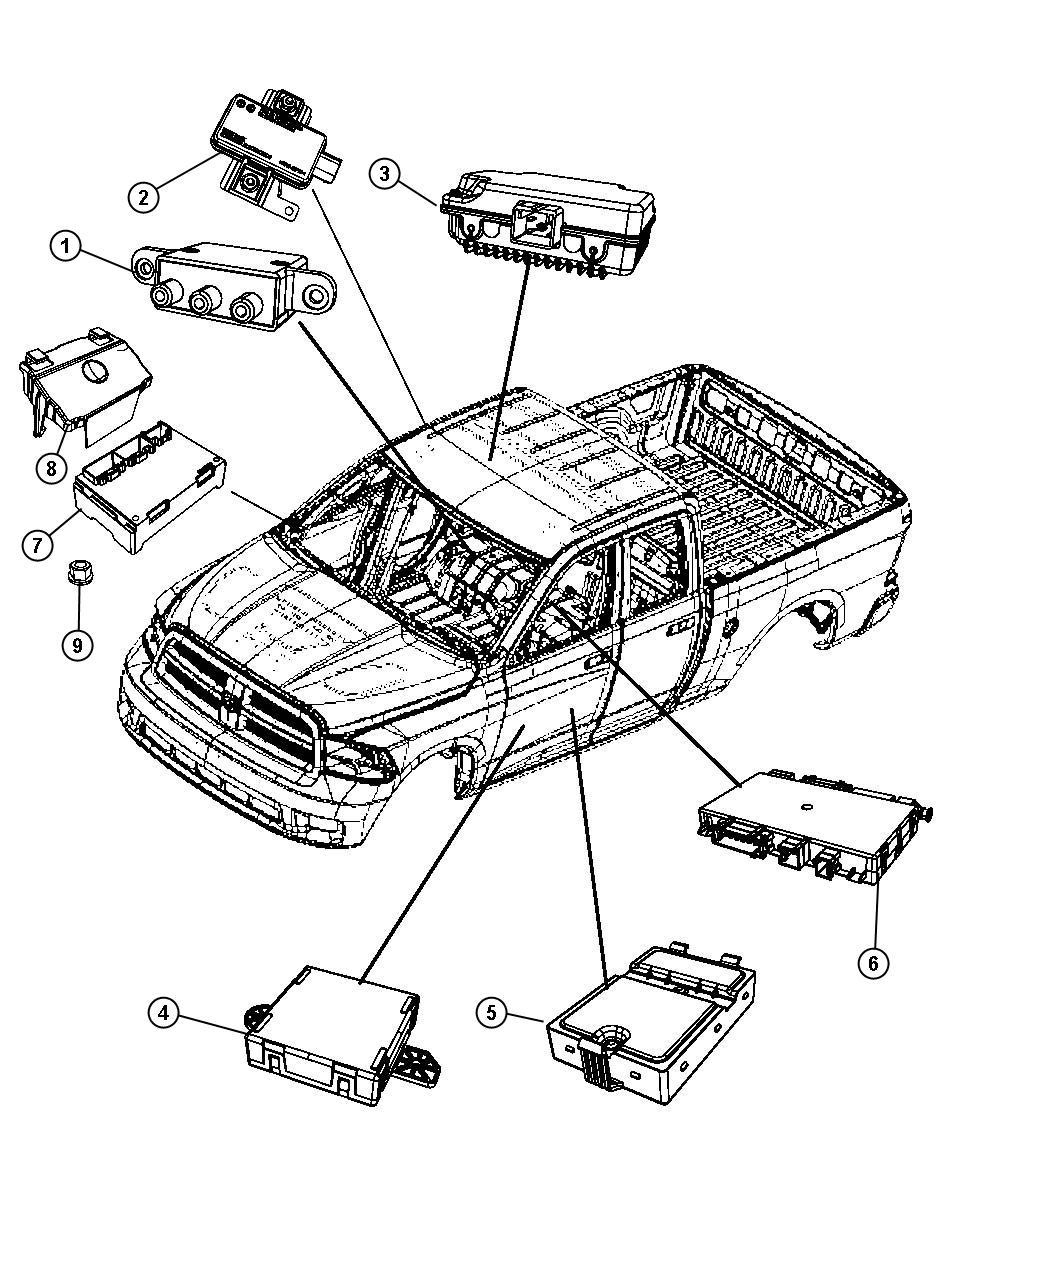 2010 Dodge Ram 1500 Module. Tire pressure monitoring